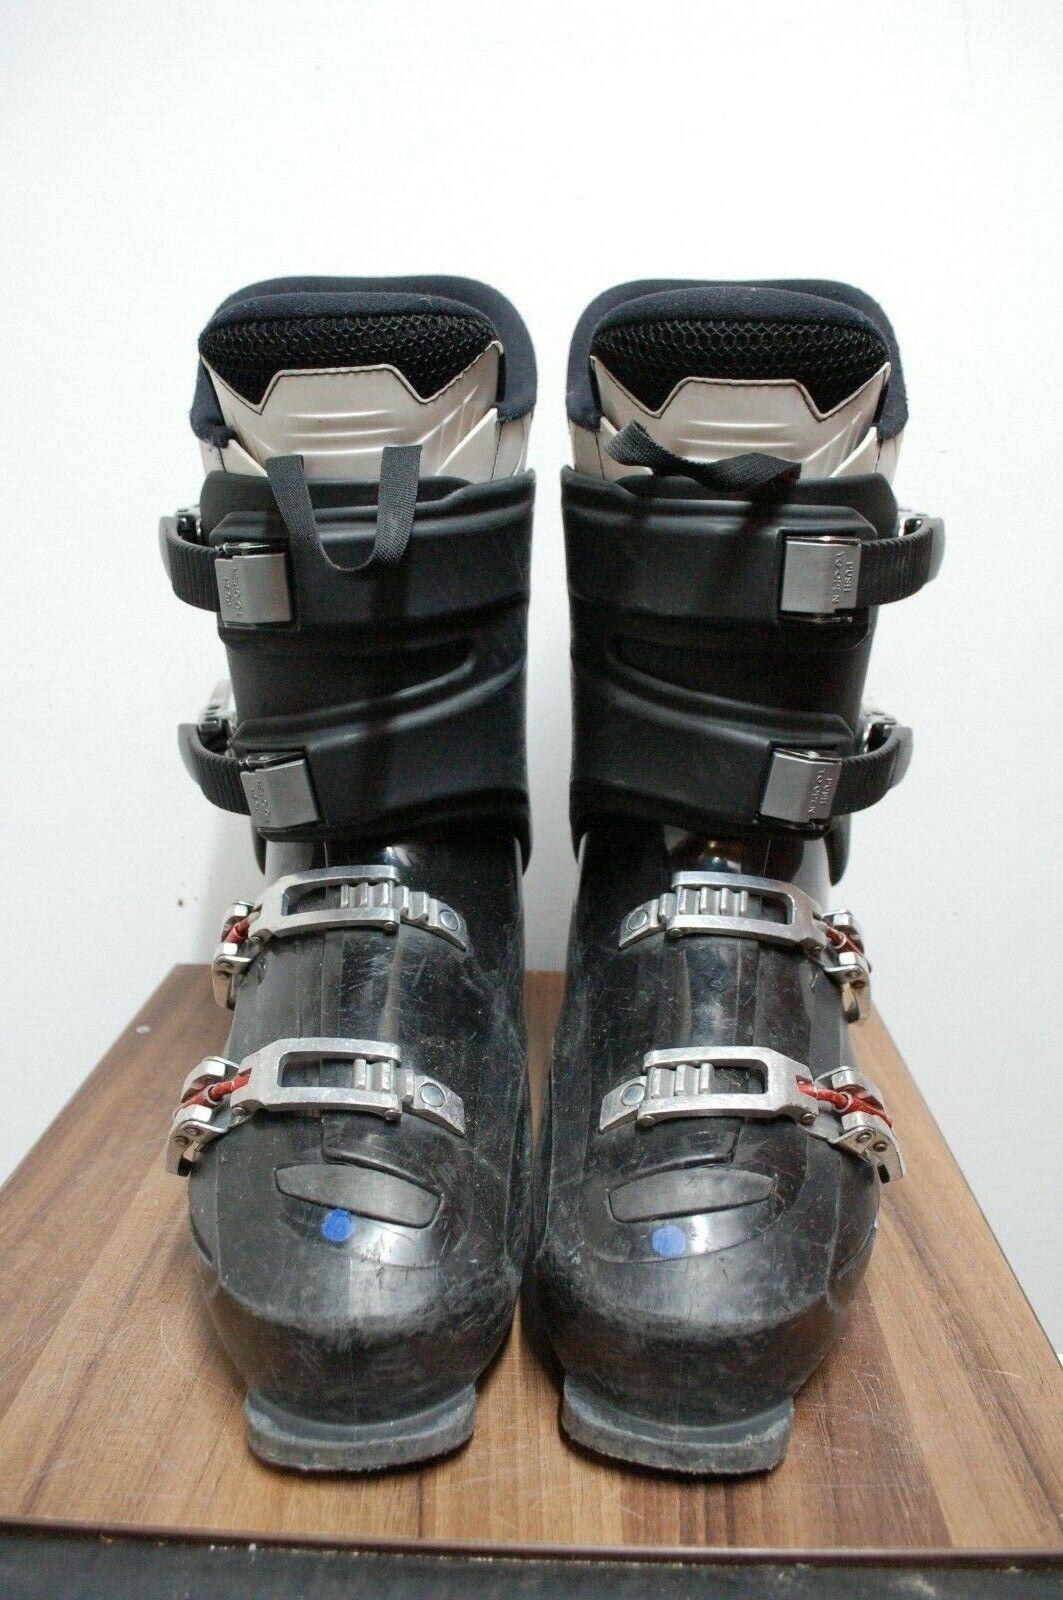 2017 Rossignol Flash IRS Ski Boots (; ; Mondo 290)